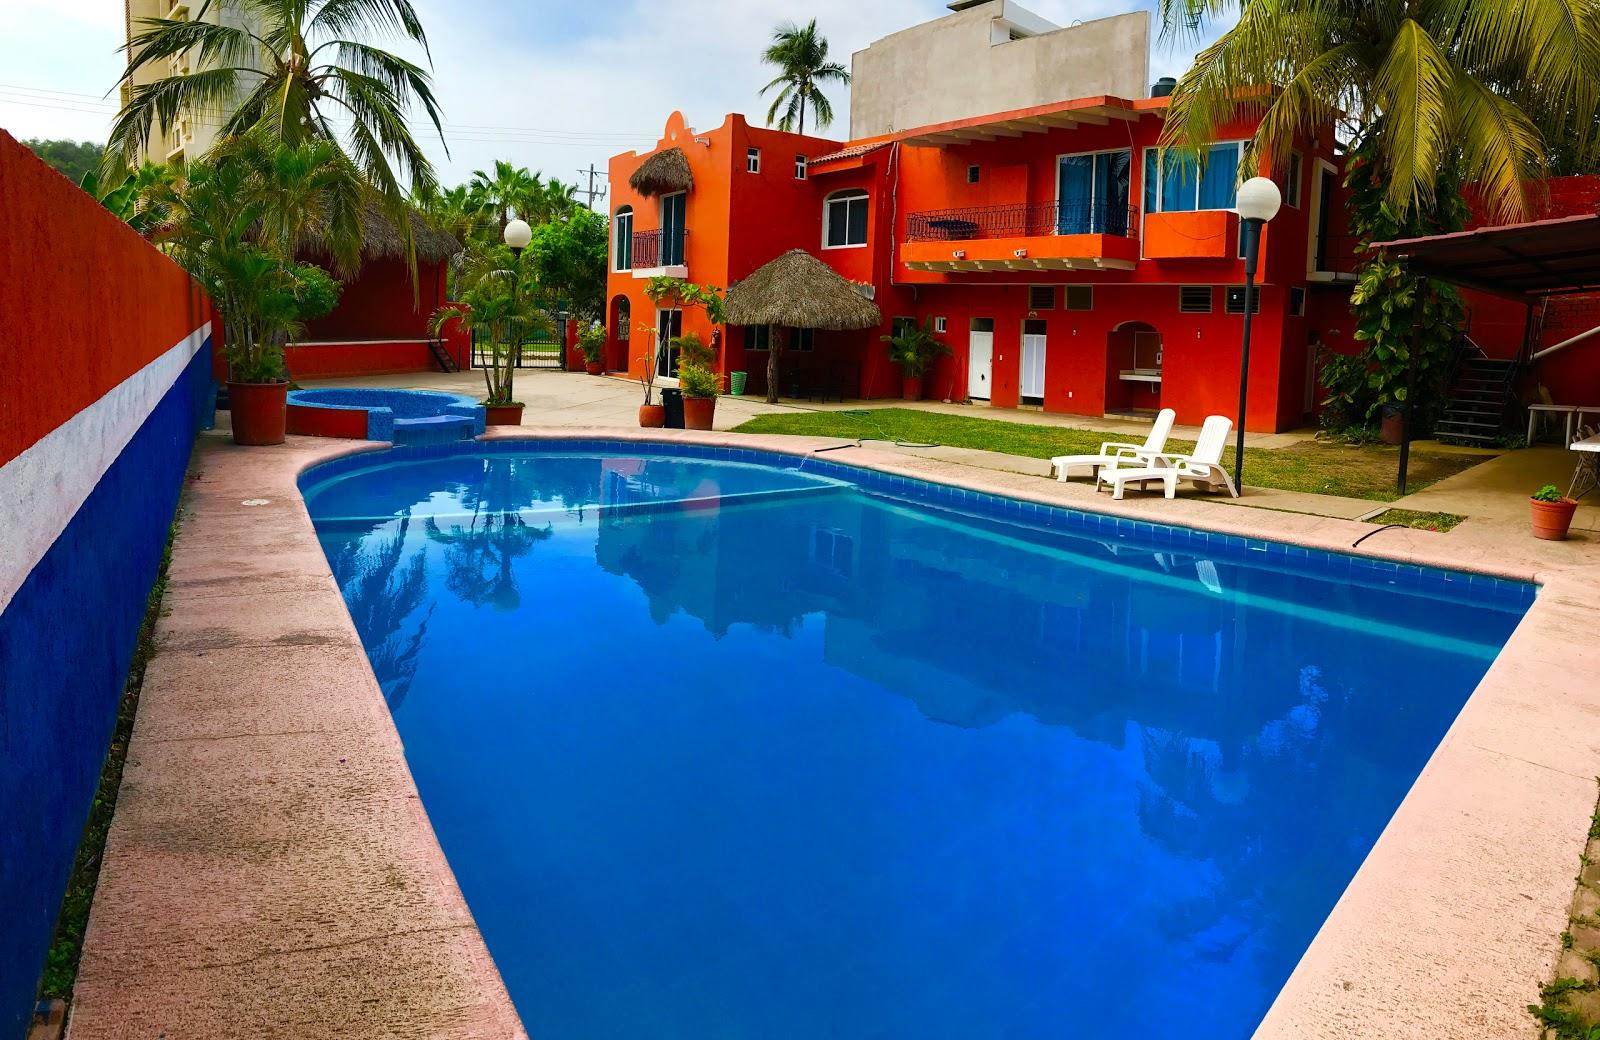 00c335285f3c8 Hotel Ayalamar Manzanillo Map - Mexico - Mapcarta